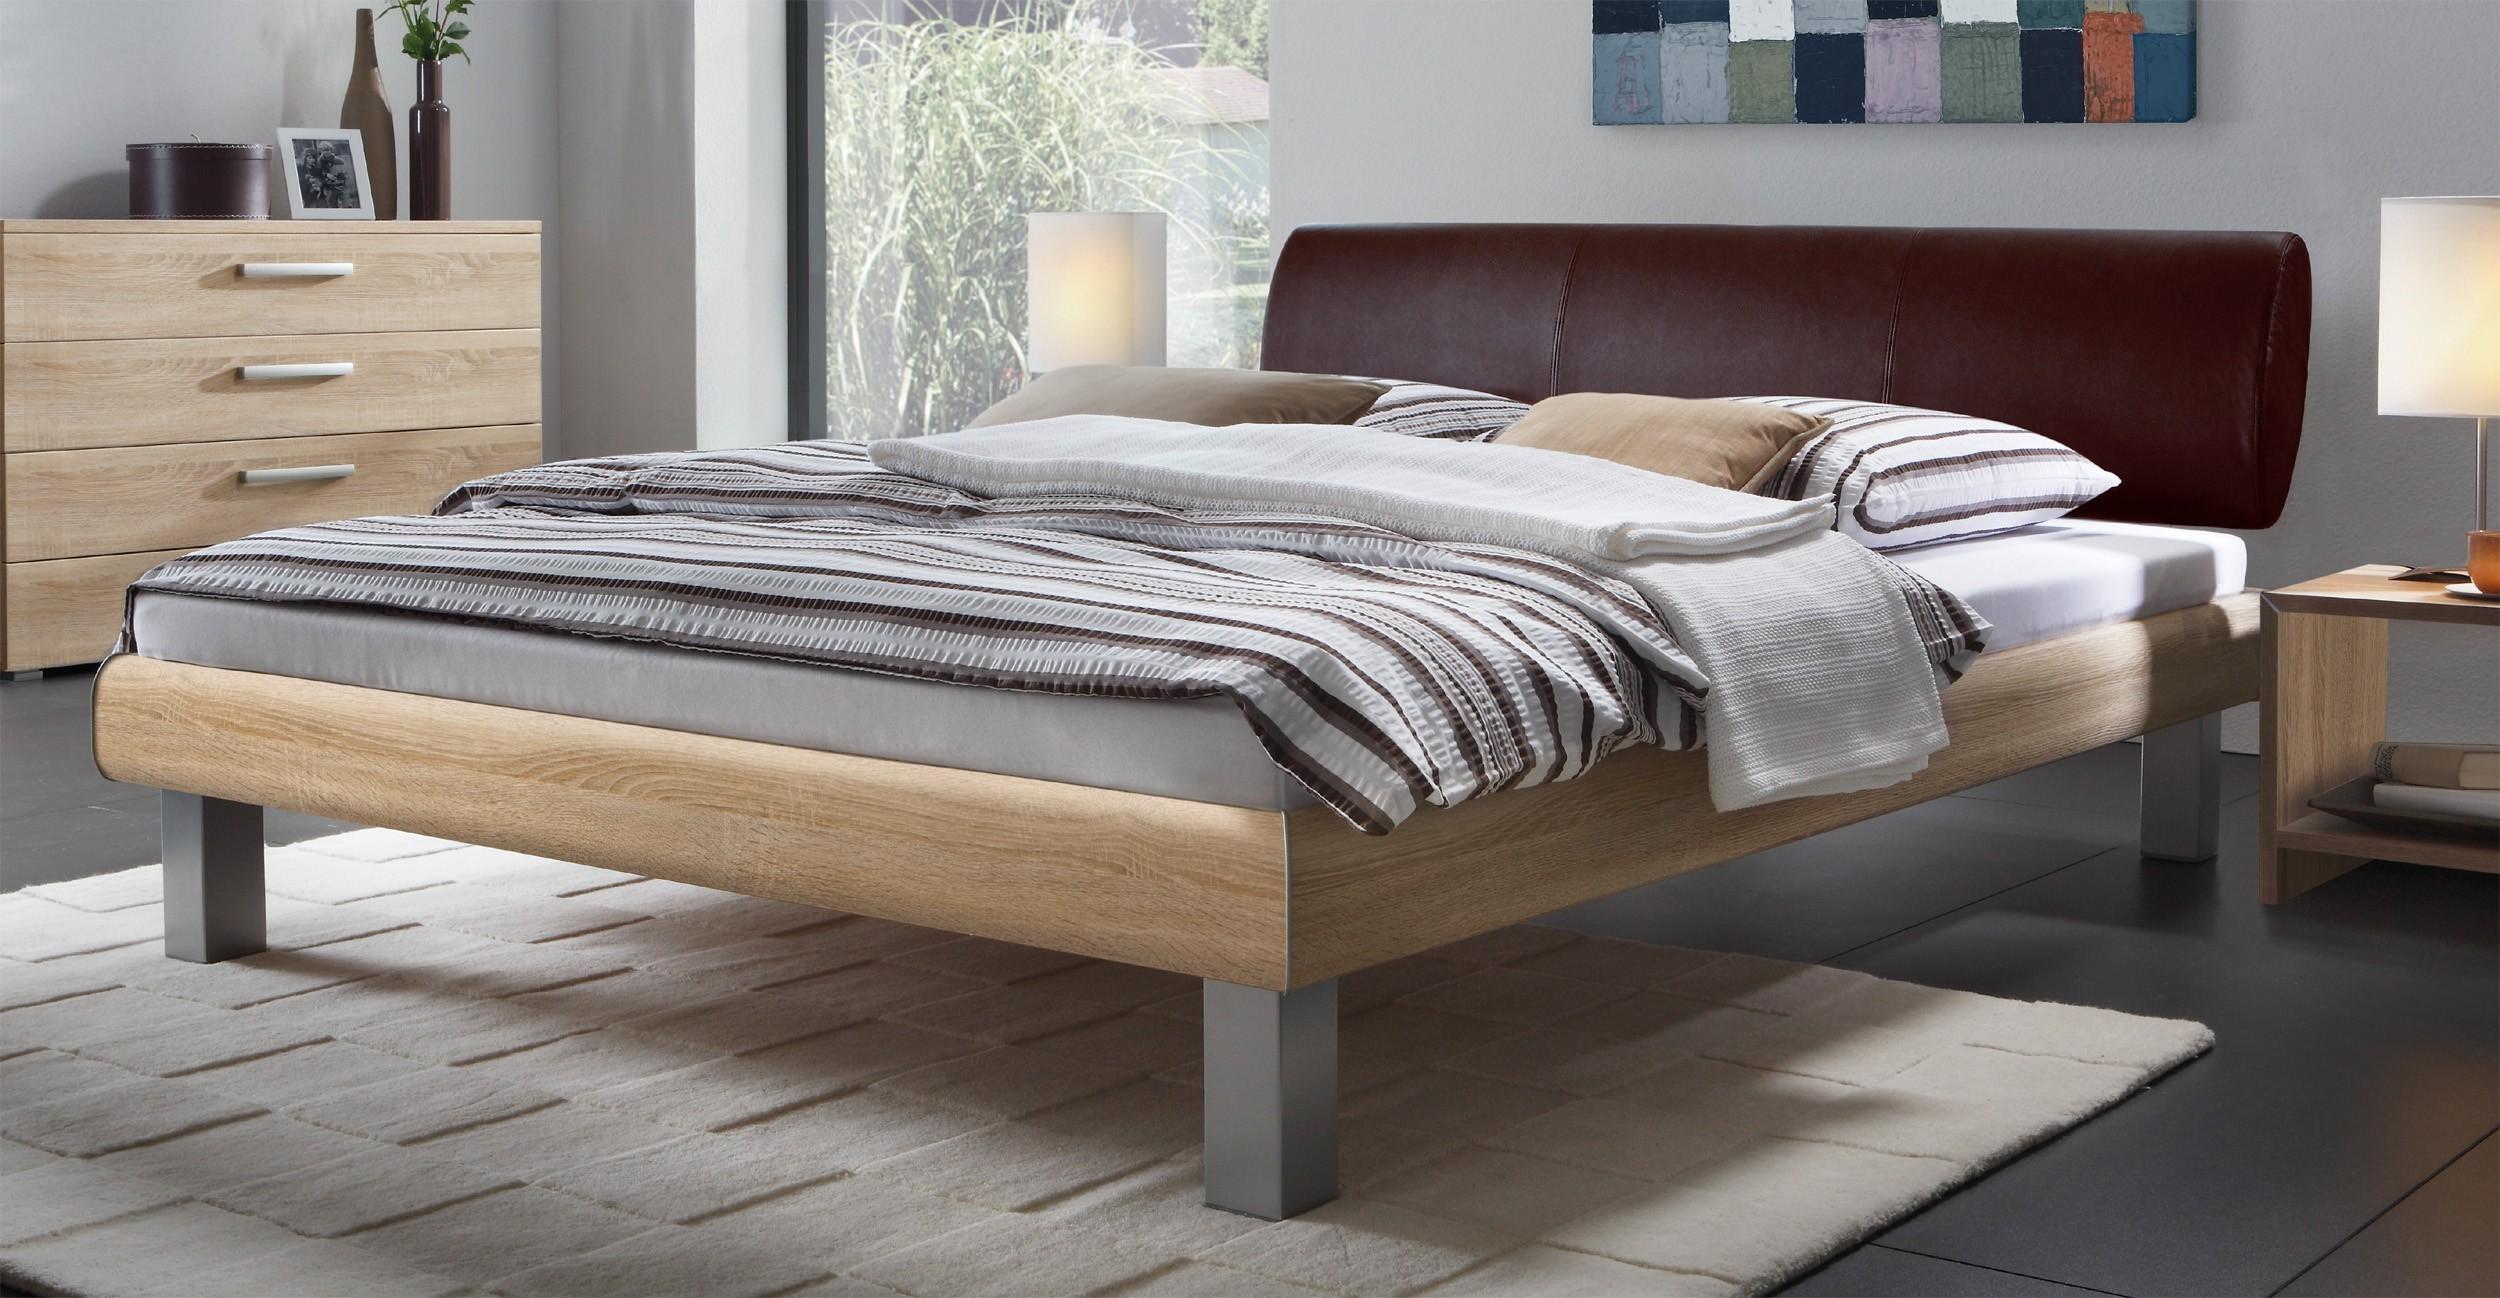 kojenbett 90x190 good bett x cm einzelbett holzbett natur lackiert kiefer massiv with kojenbett. Black Bedroom Furniture Sets. Home Design Ideas